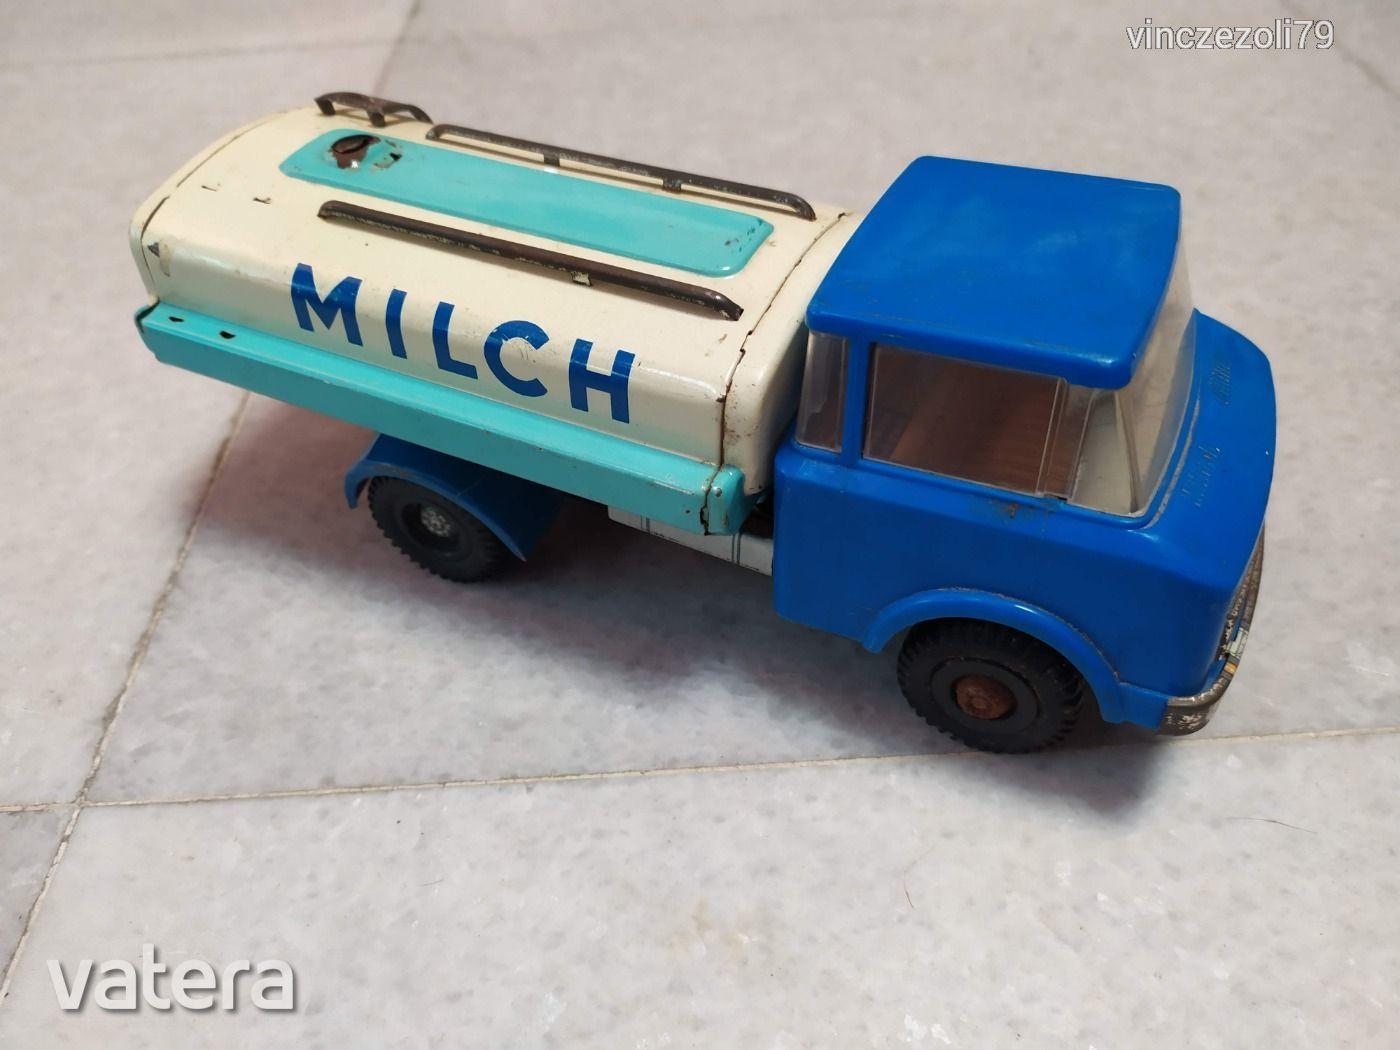 lkw-tejszallito-teherauto-ms-brandenburg-gyartmany-0bea_1_big.jpg